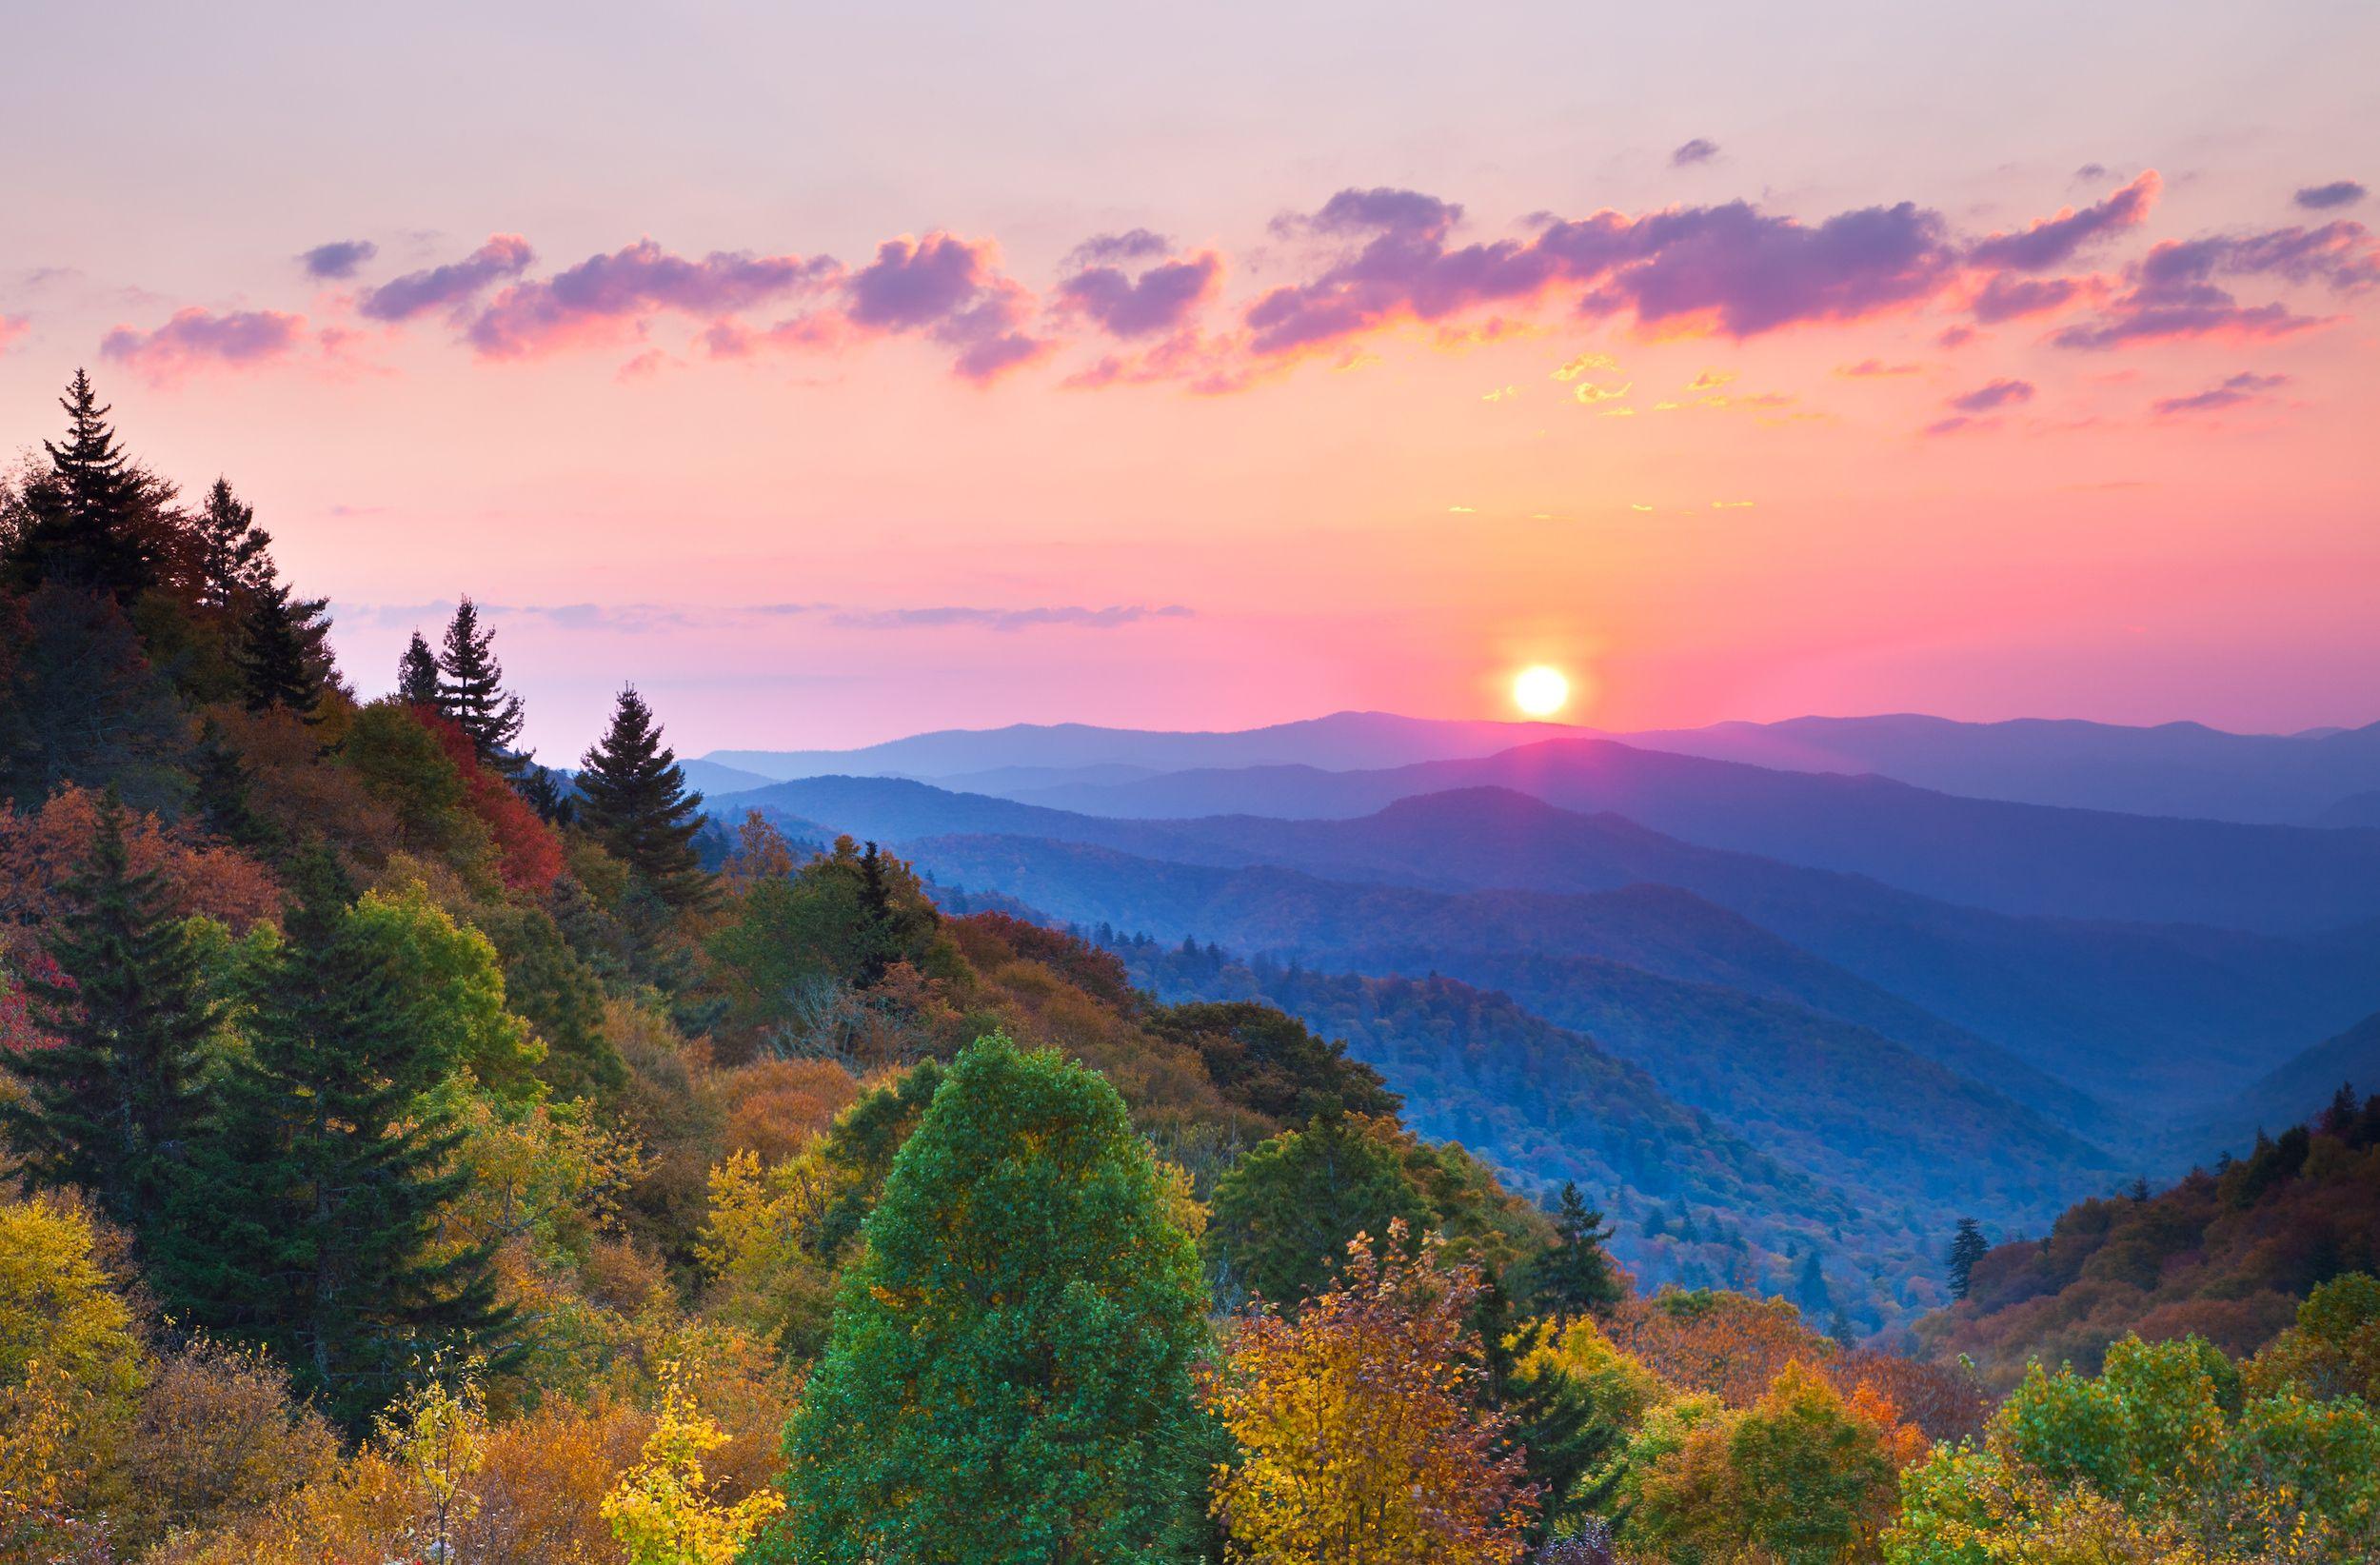 Guida al Great Smoky Mountains National Park